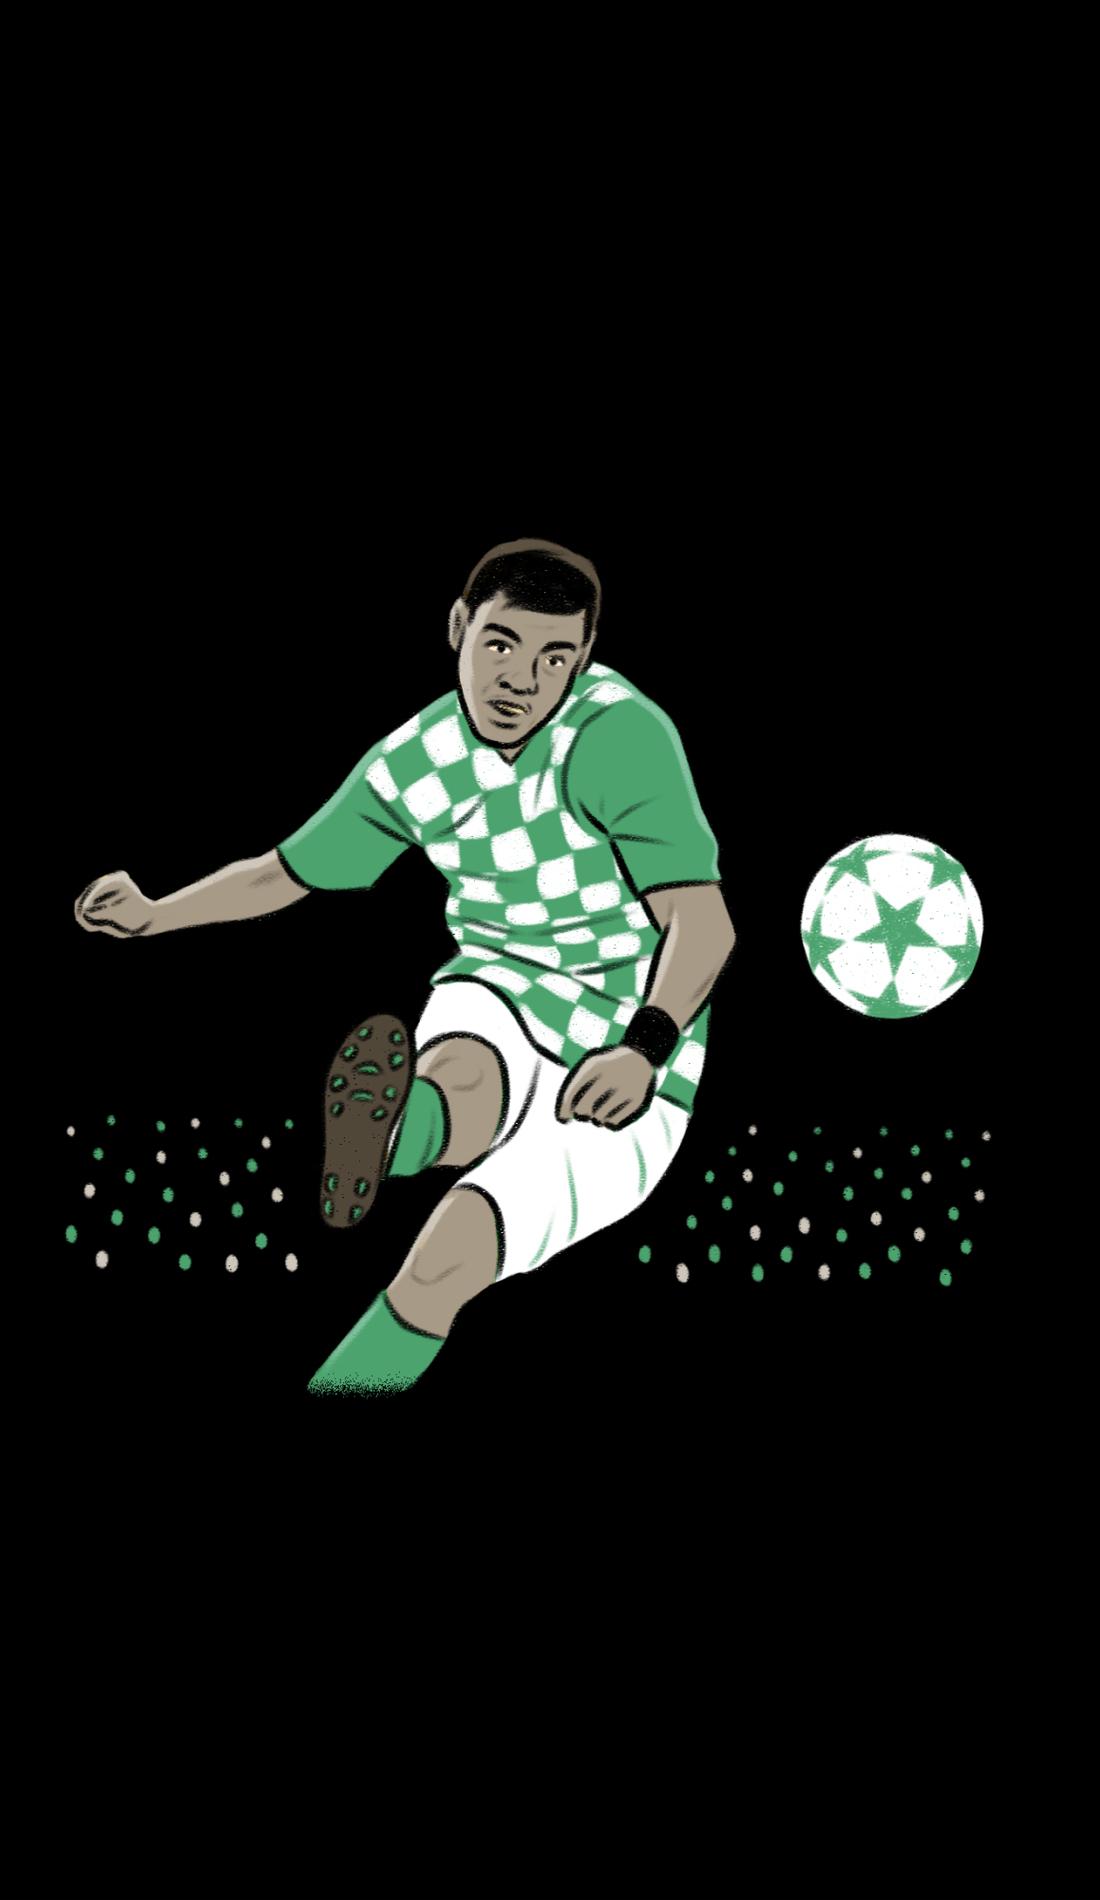 A UEFA Champions League live event